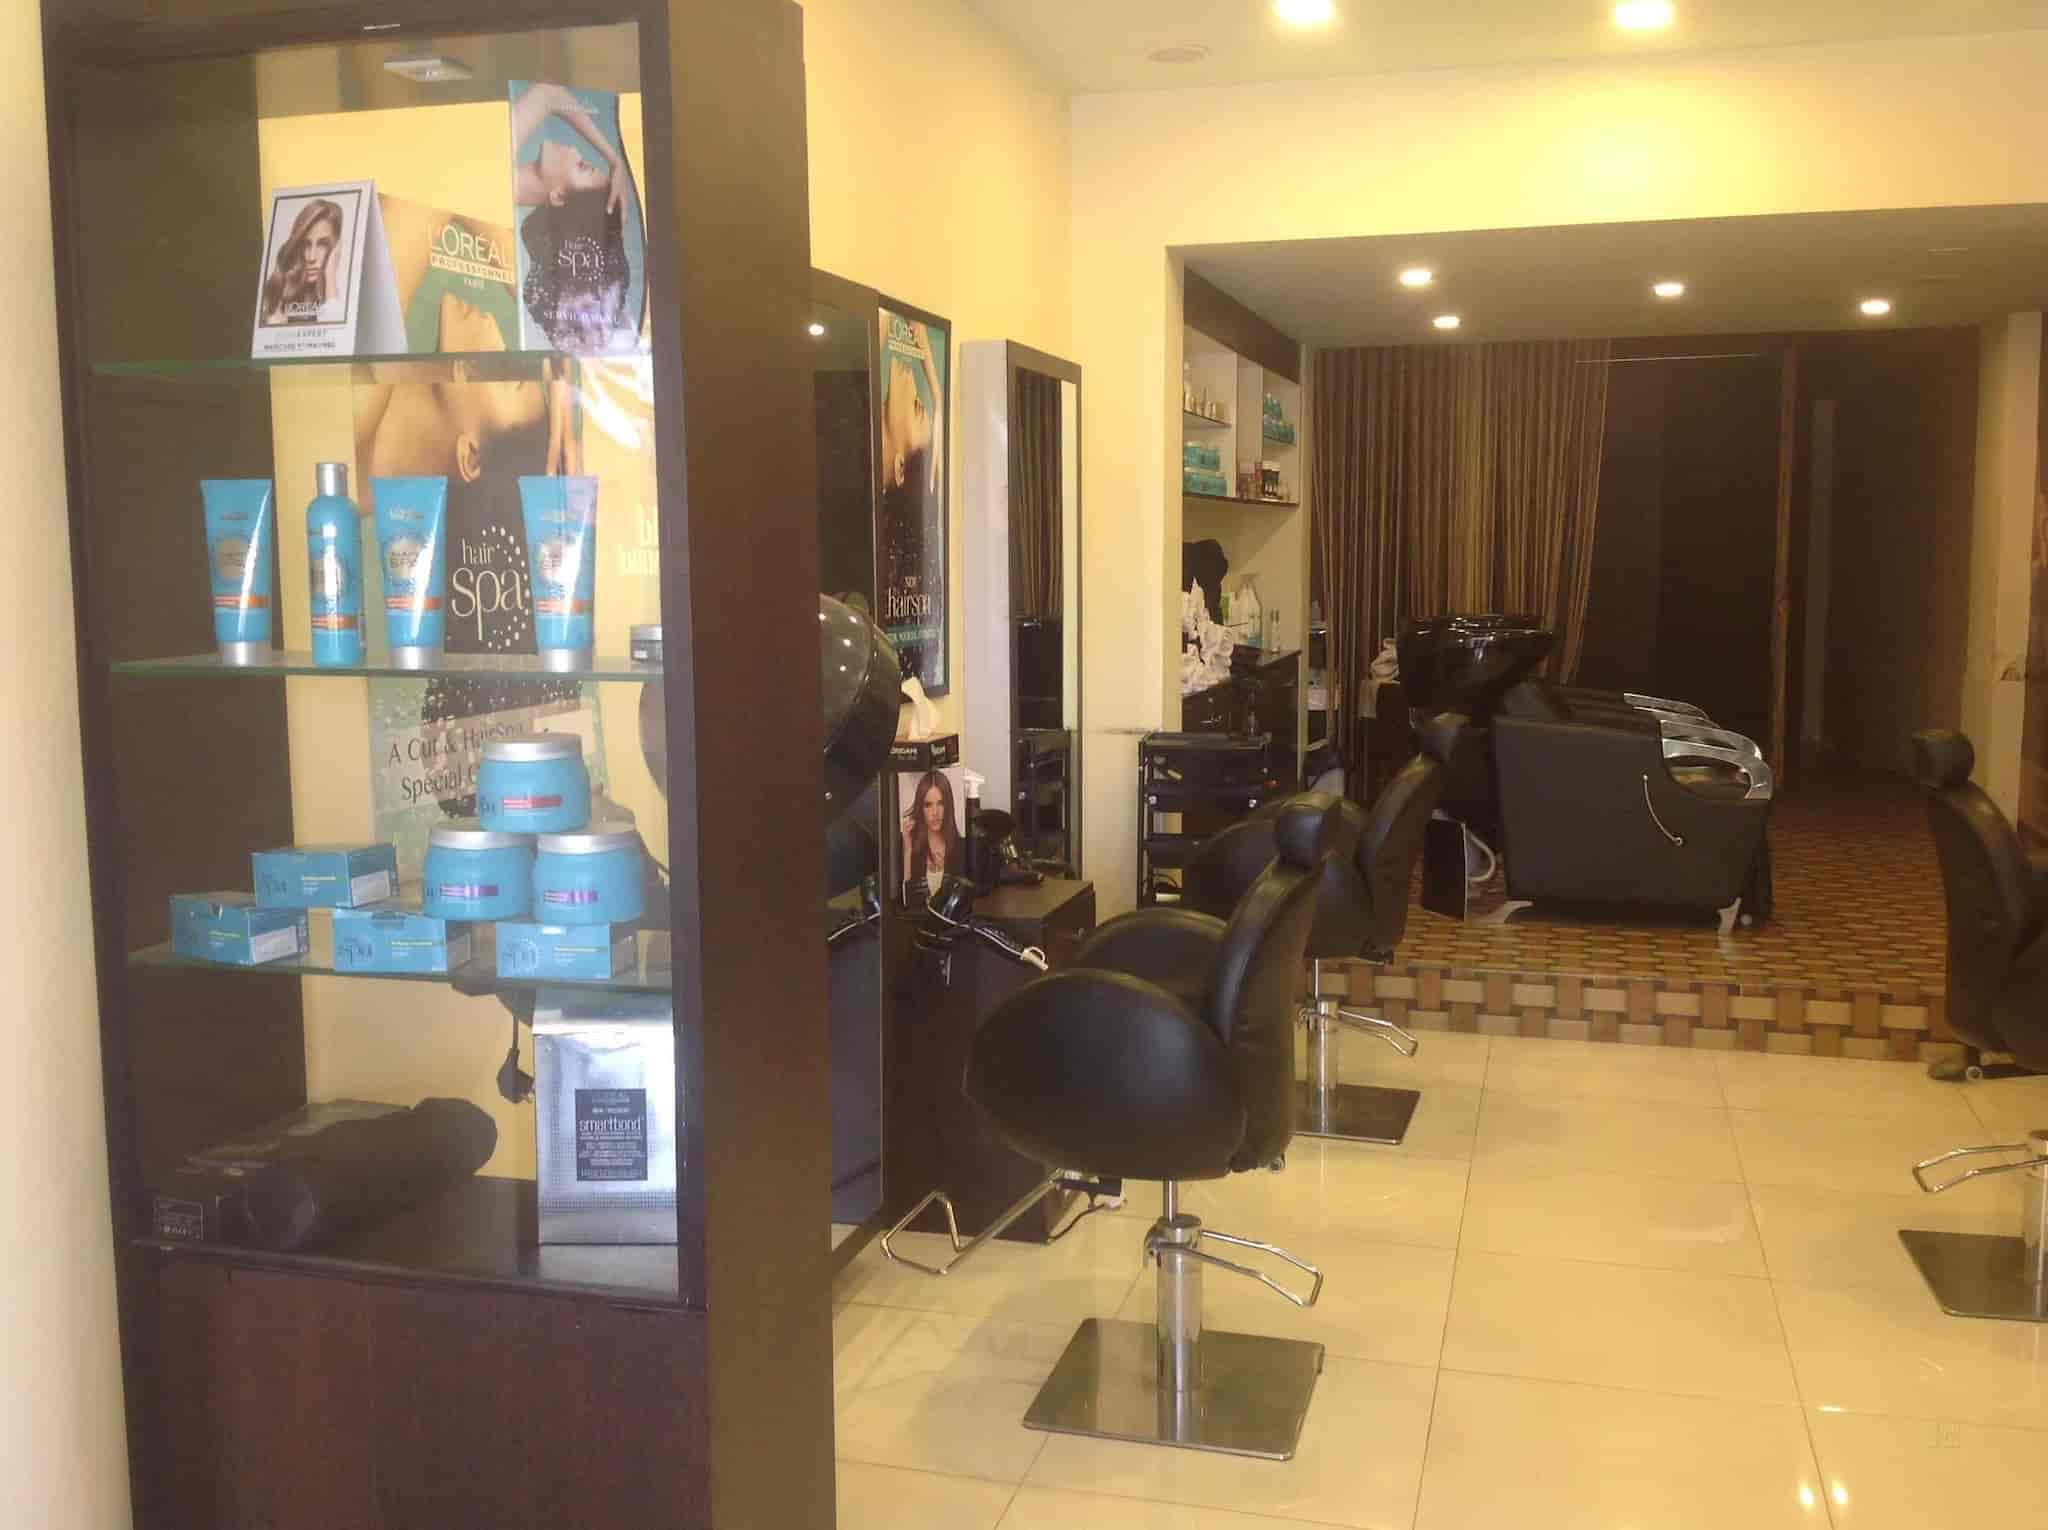 Coiffure Unisex Salon Photos Ambawadi Ahmedabad Pictures Images